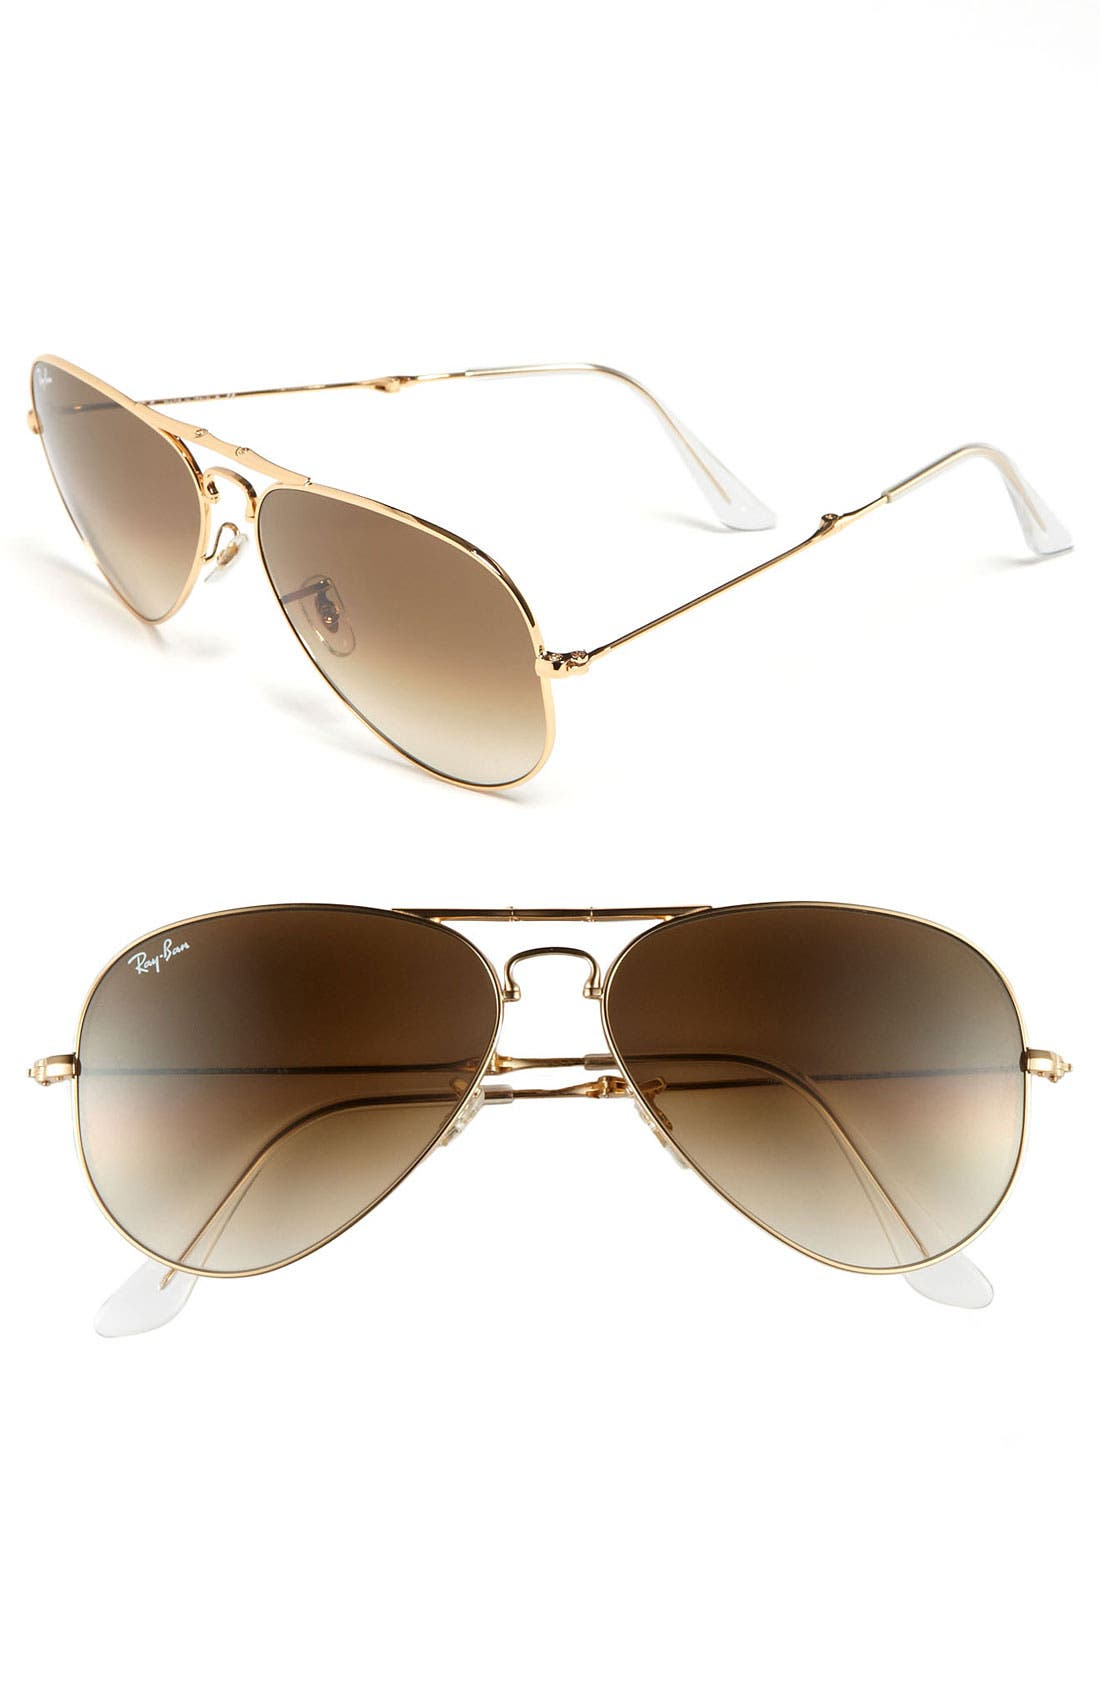 Main Image - Ray-Ban 58mm Folding Aviator Sunglasses